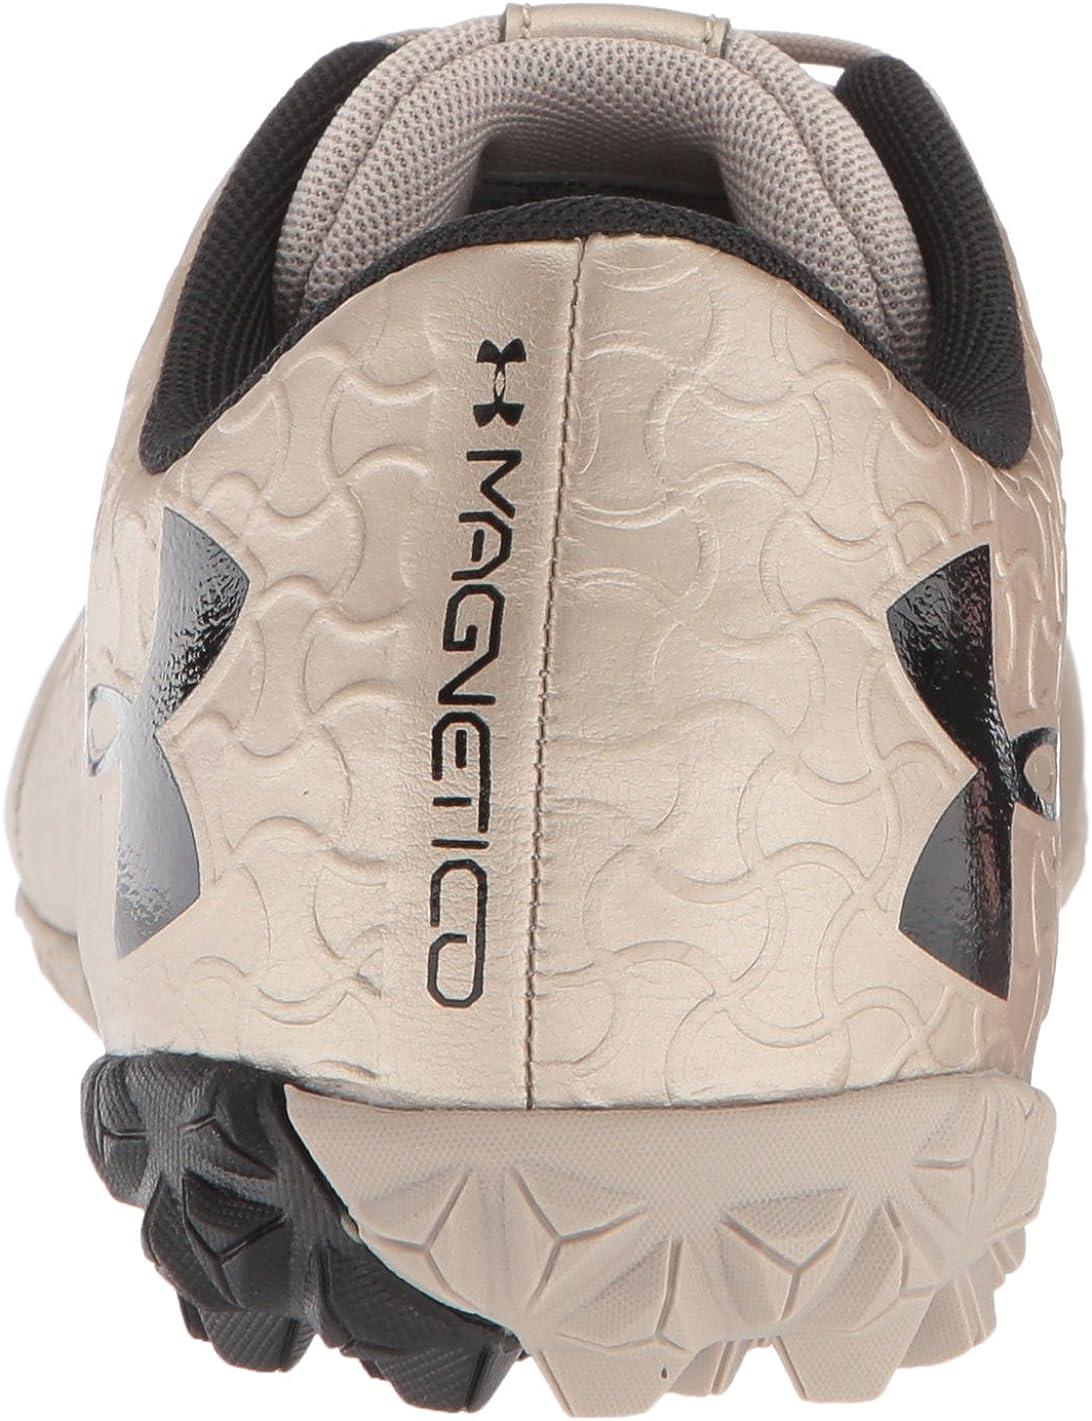 Under Armour3000116 - Magnetico Select Turf Hombres , Dorado ...